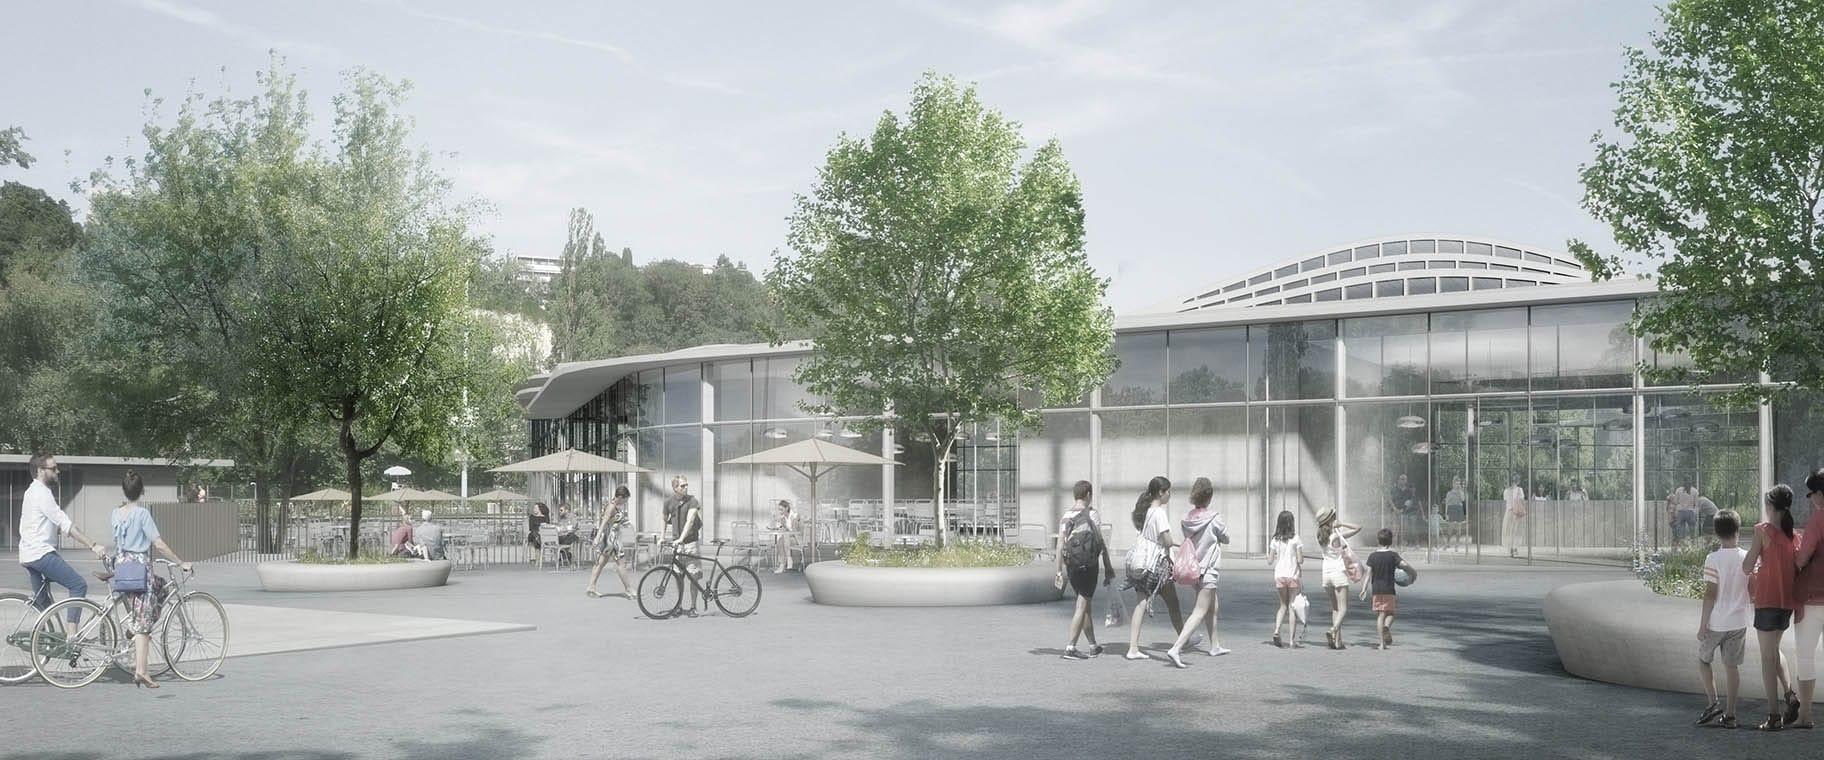 perspective-concours-piscine-fontenette-carouge-projet-vimade-architectes-paysagistes-collinfontaine-archigraphie-esplanade